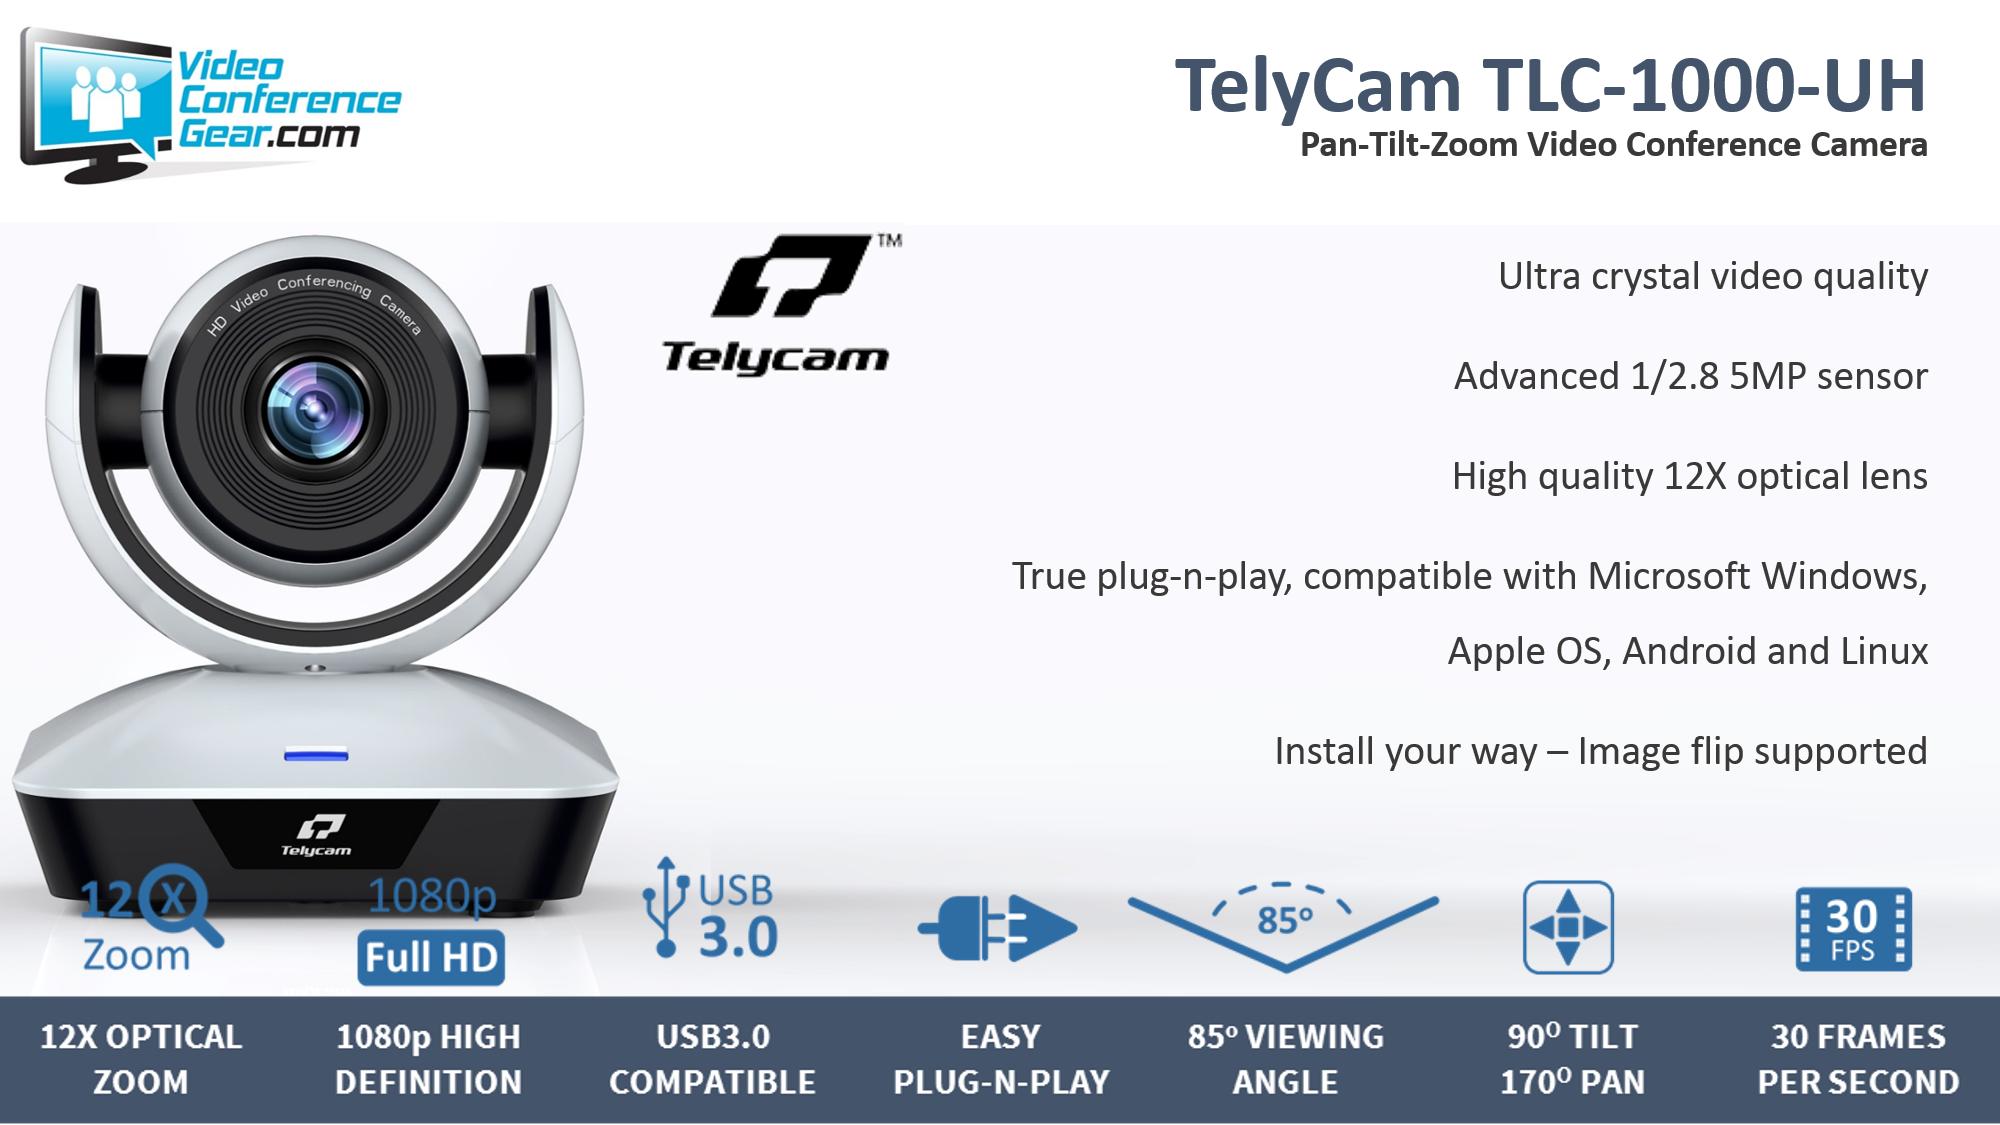 TelyCam TLC-1000-HU